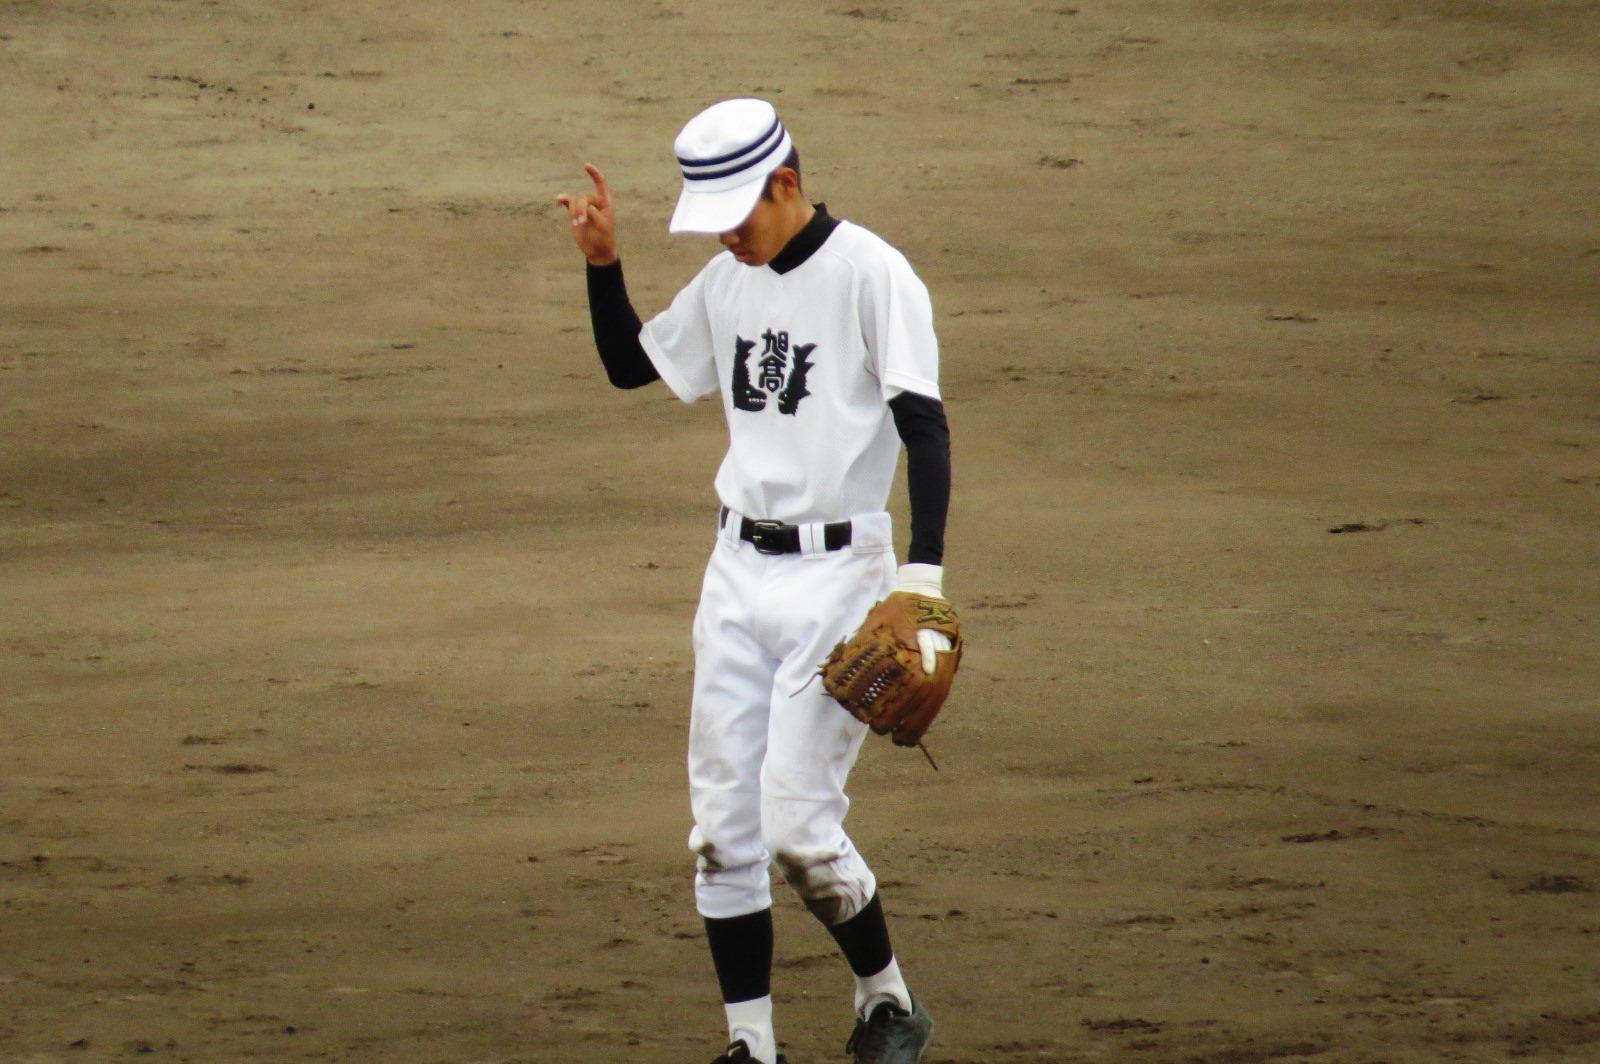 桜丘(愛知)高校野球部メンバー一覧  年/愛知 …